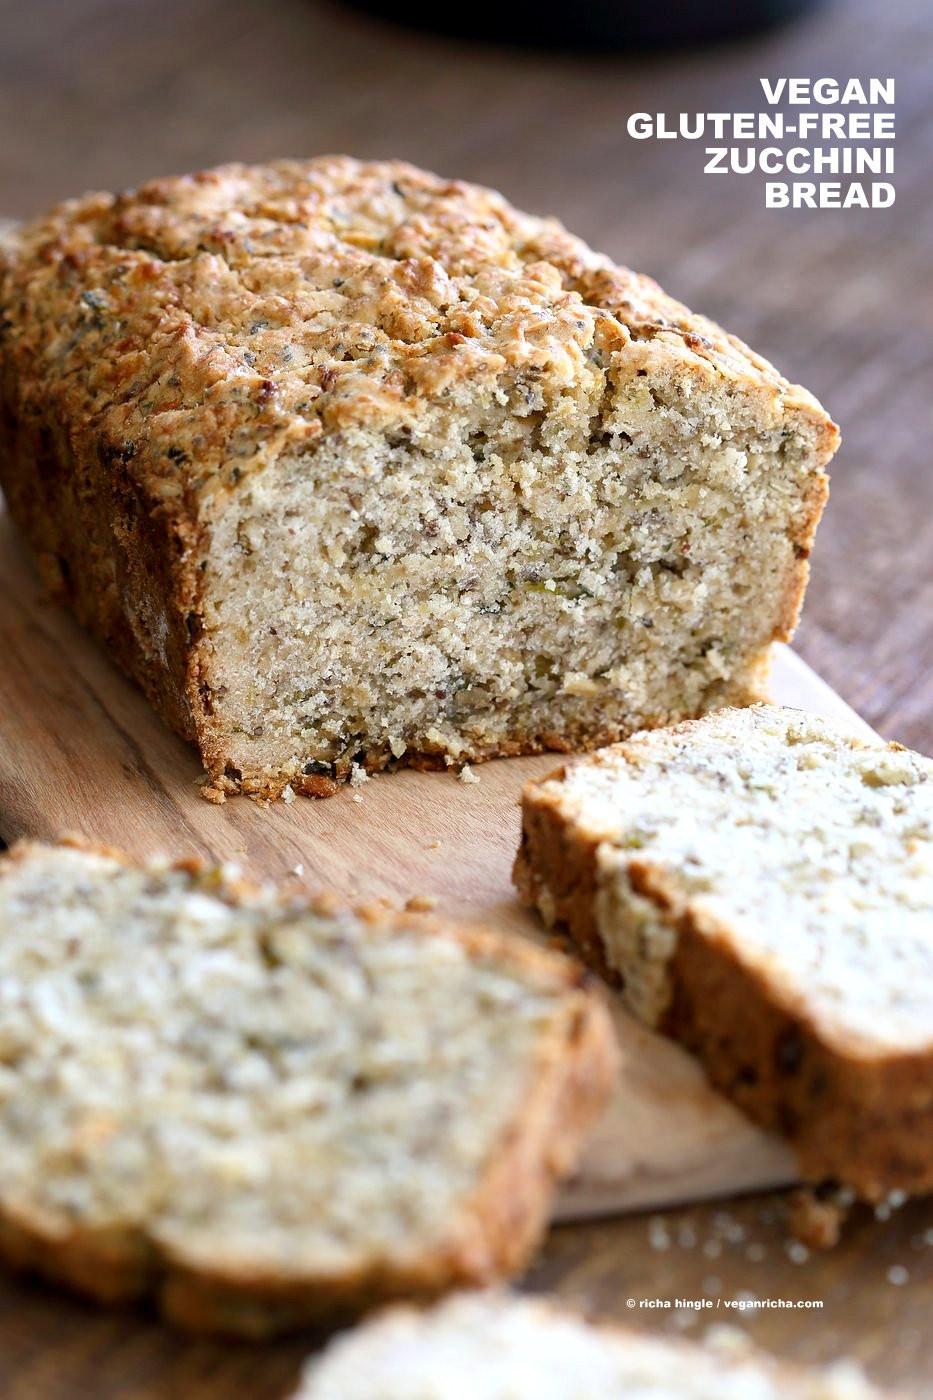 Gluten Free Vegan Bread Recipe  Vegan Gluten free Zucchini Bread Recipe Vegan Richa